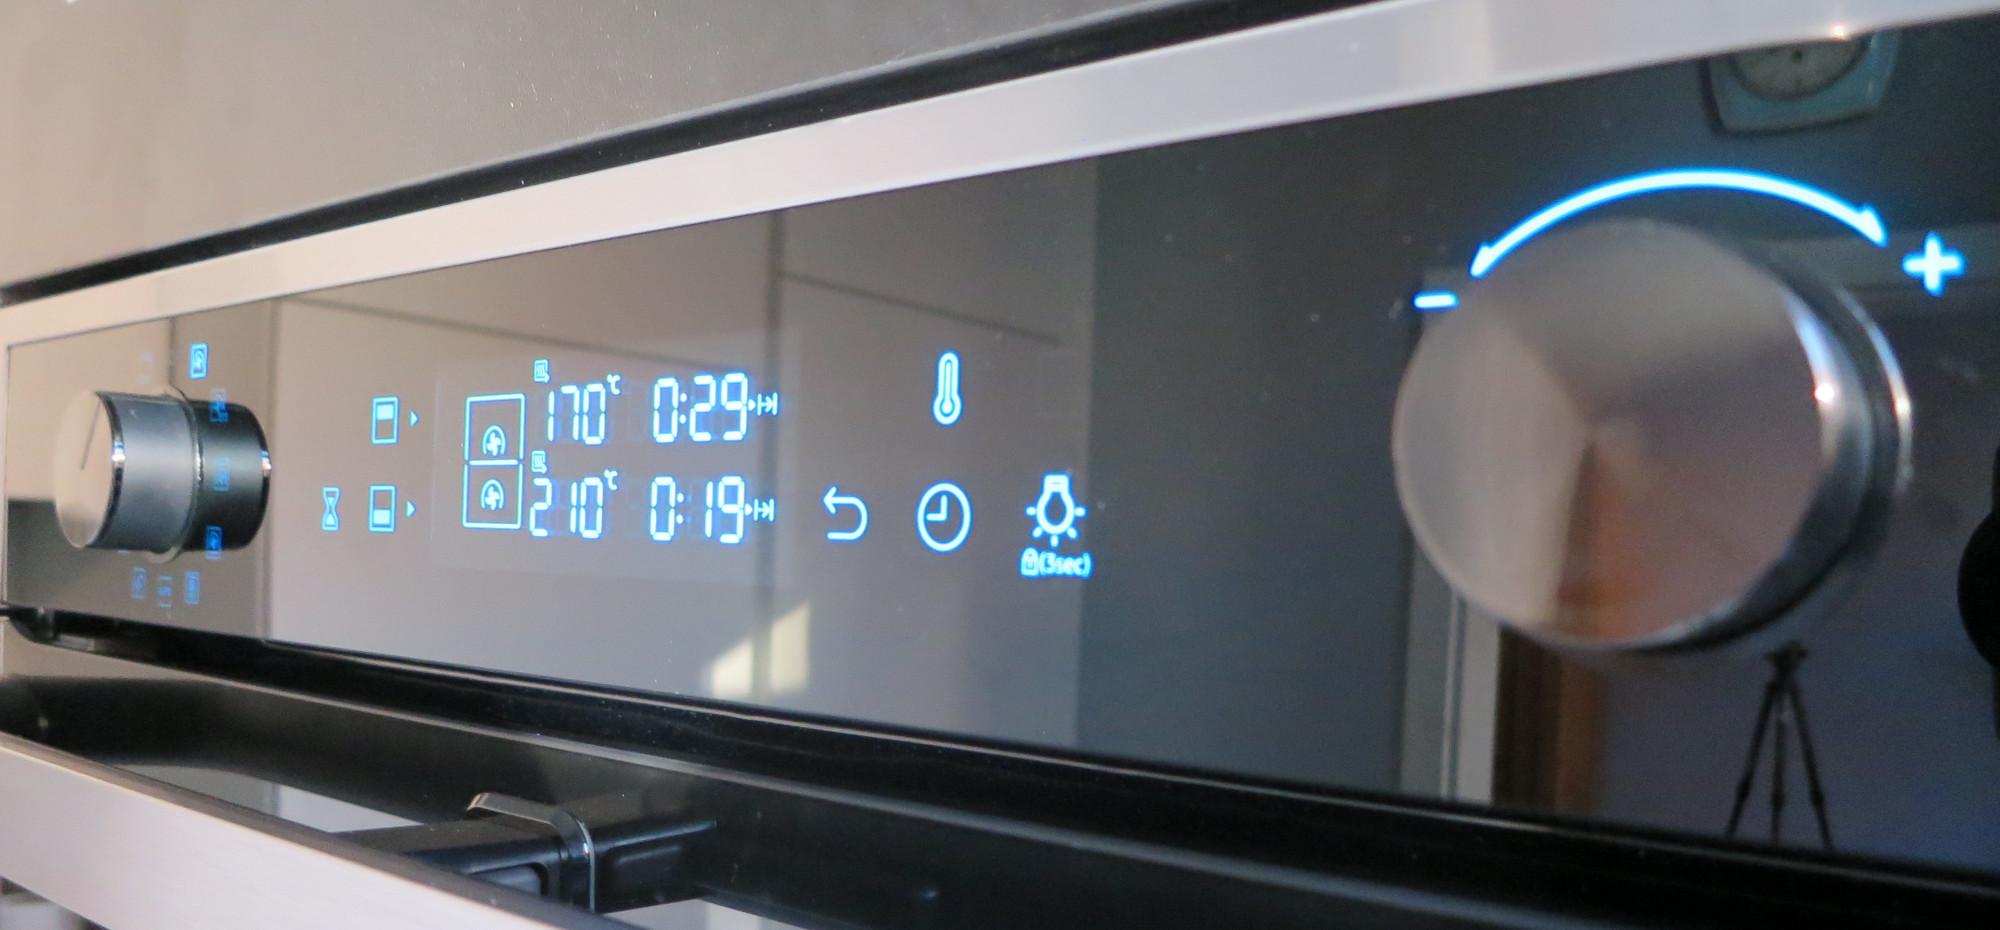 Backofen Samsung Dual Cook Flex Bedienung